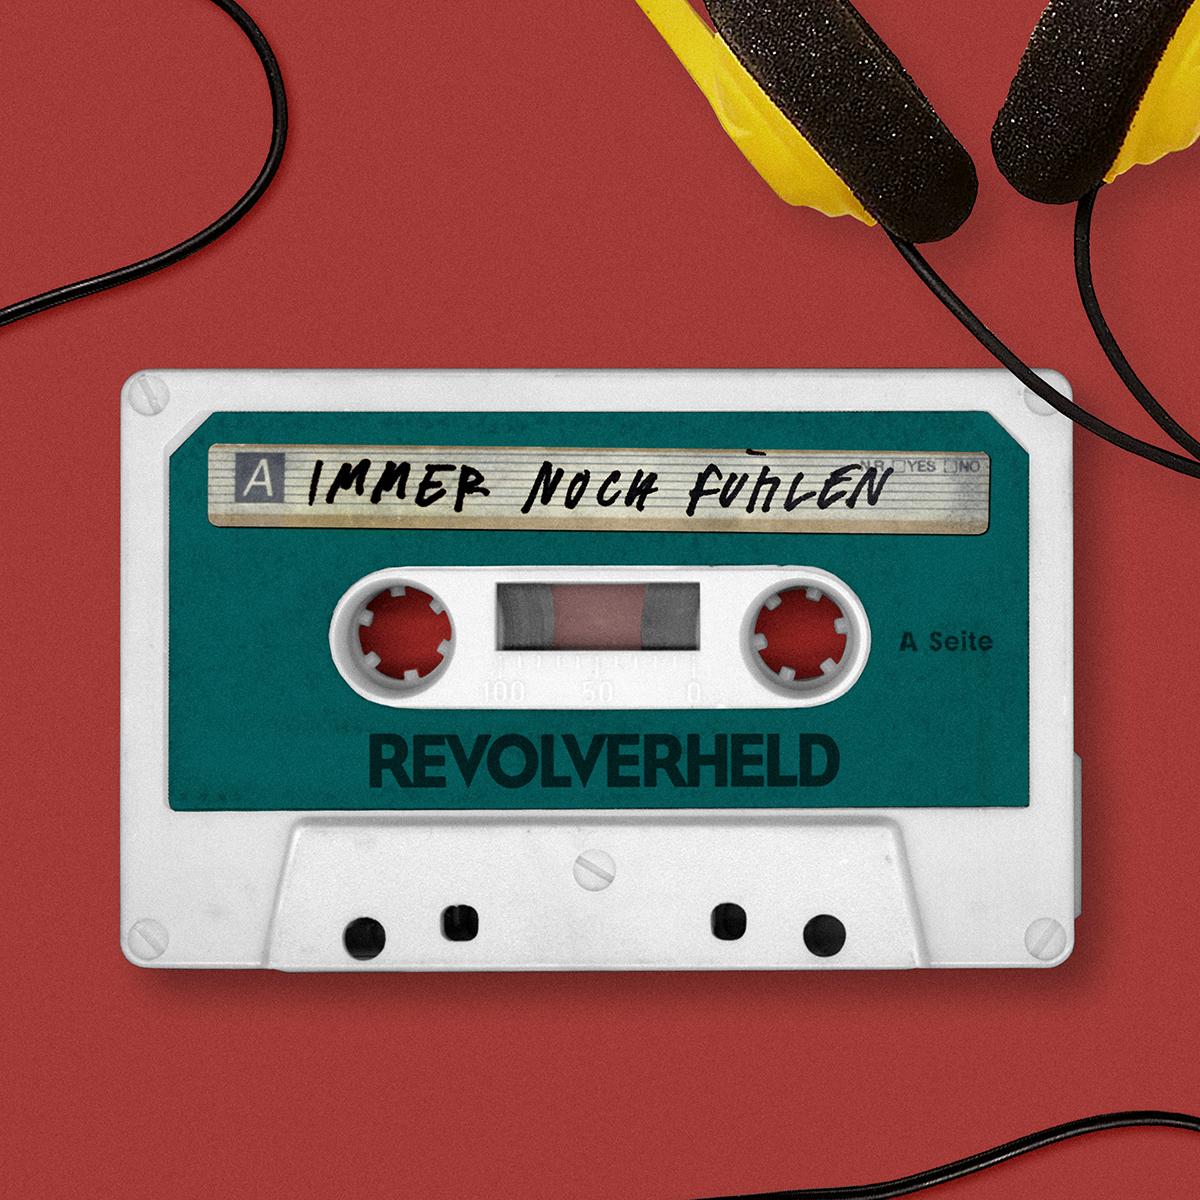 Related gallery:: Immer in bewegung revolverheld itunes music store